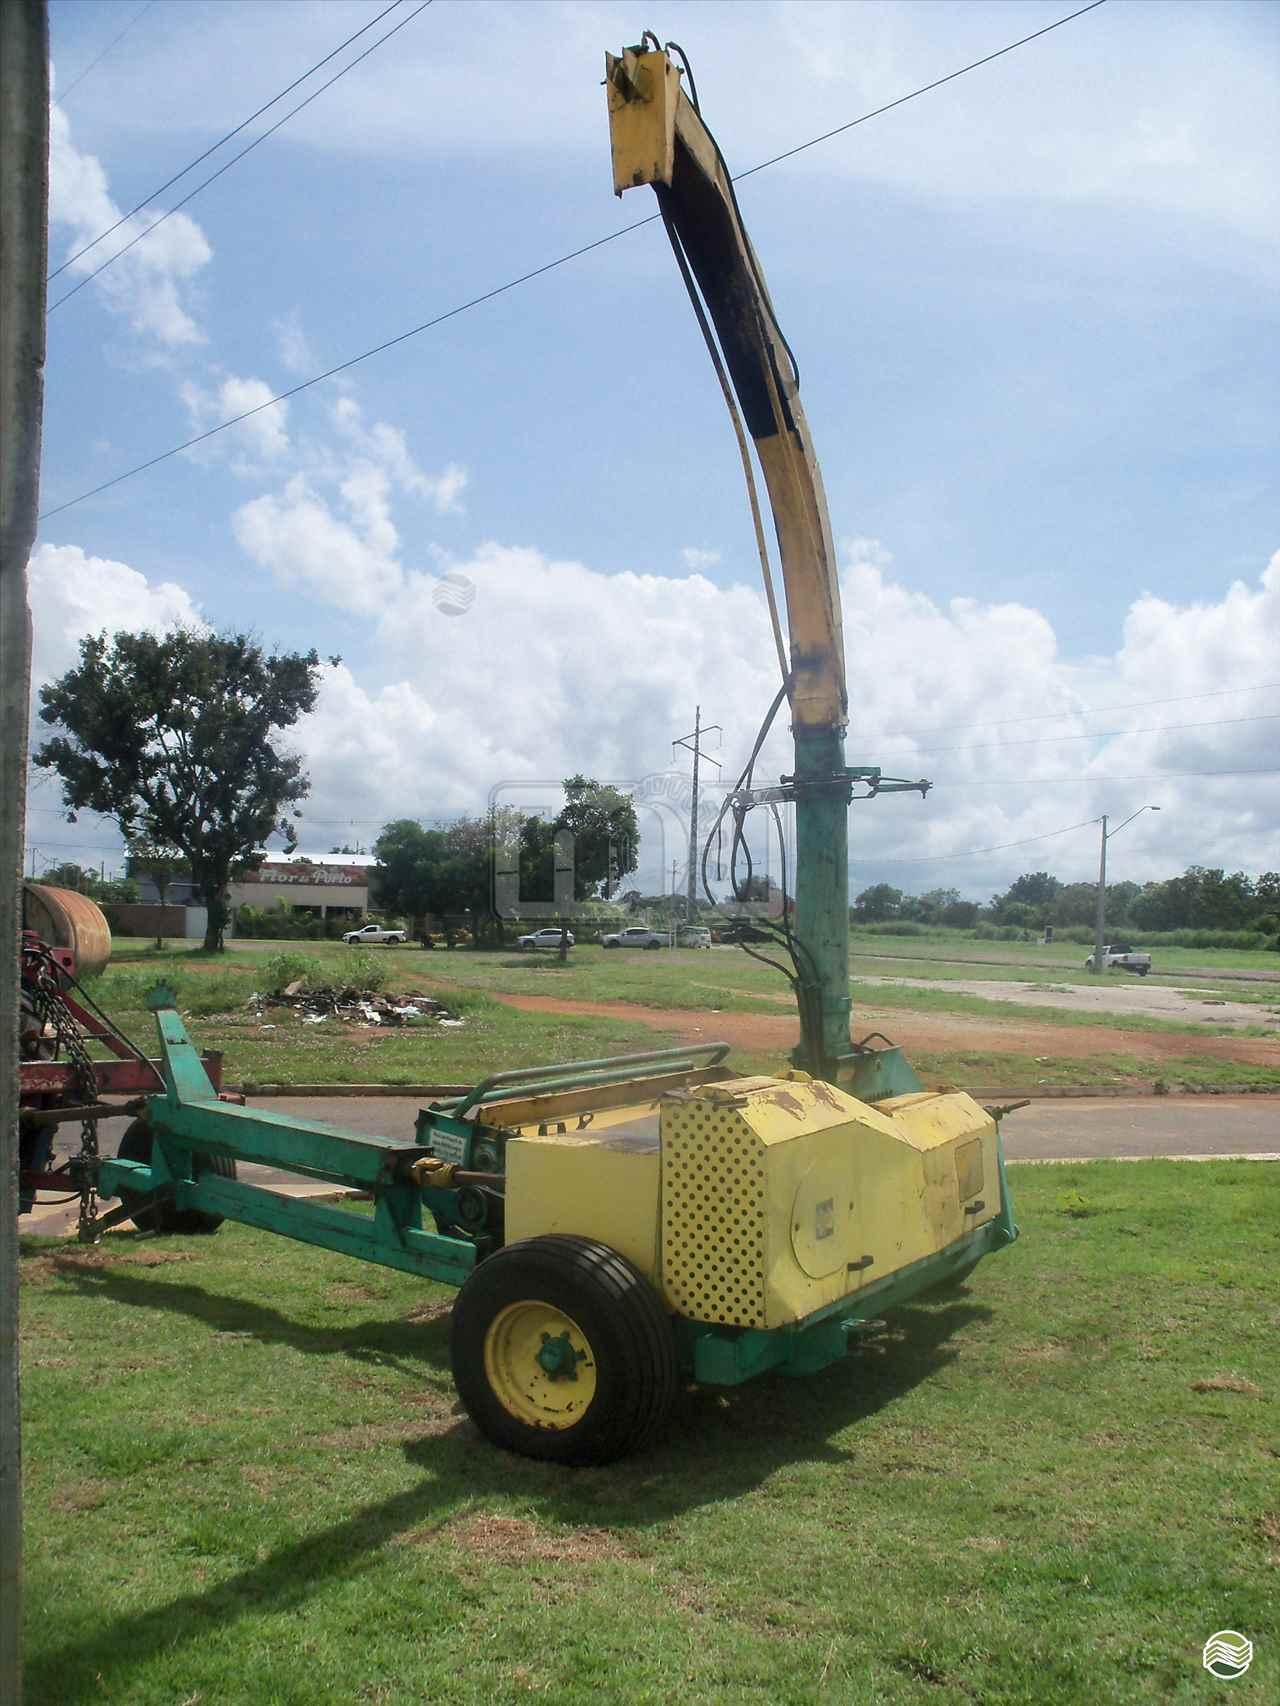 IMPLEMENTOS AGRICOLAS ENSILADEIRA COLHEDORA DE CAPIM Moi Maquinas e Implementos Agricolas PORTO NACIONAL TOCANTINS TO